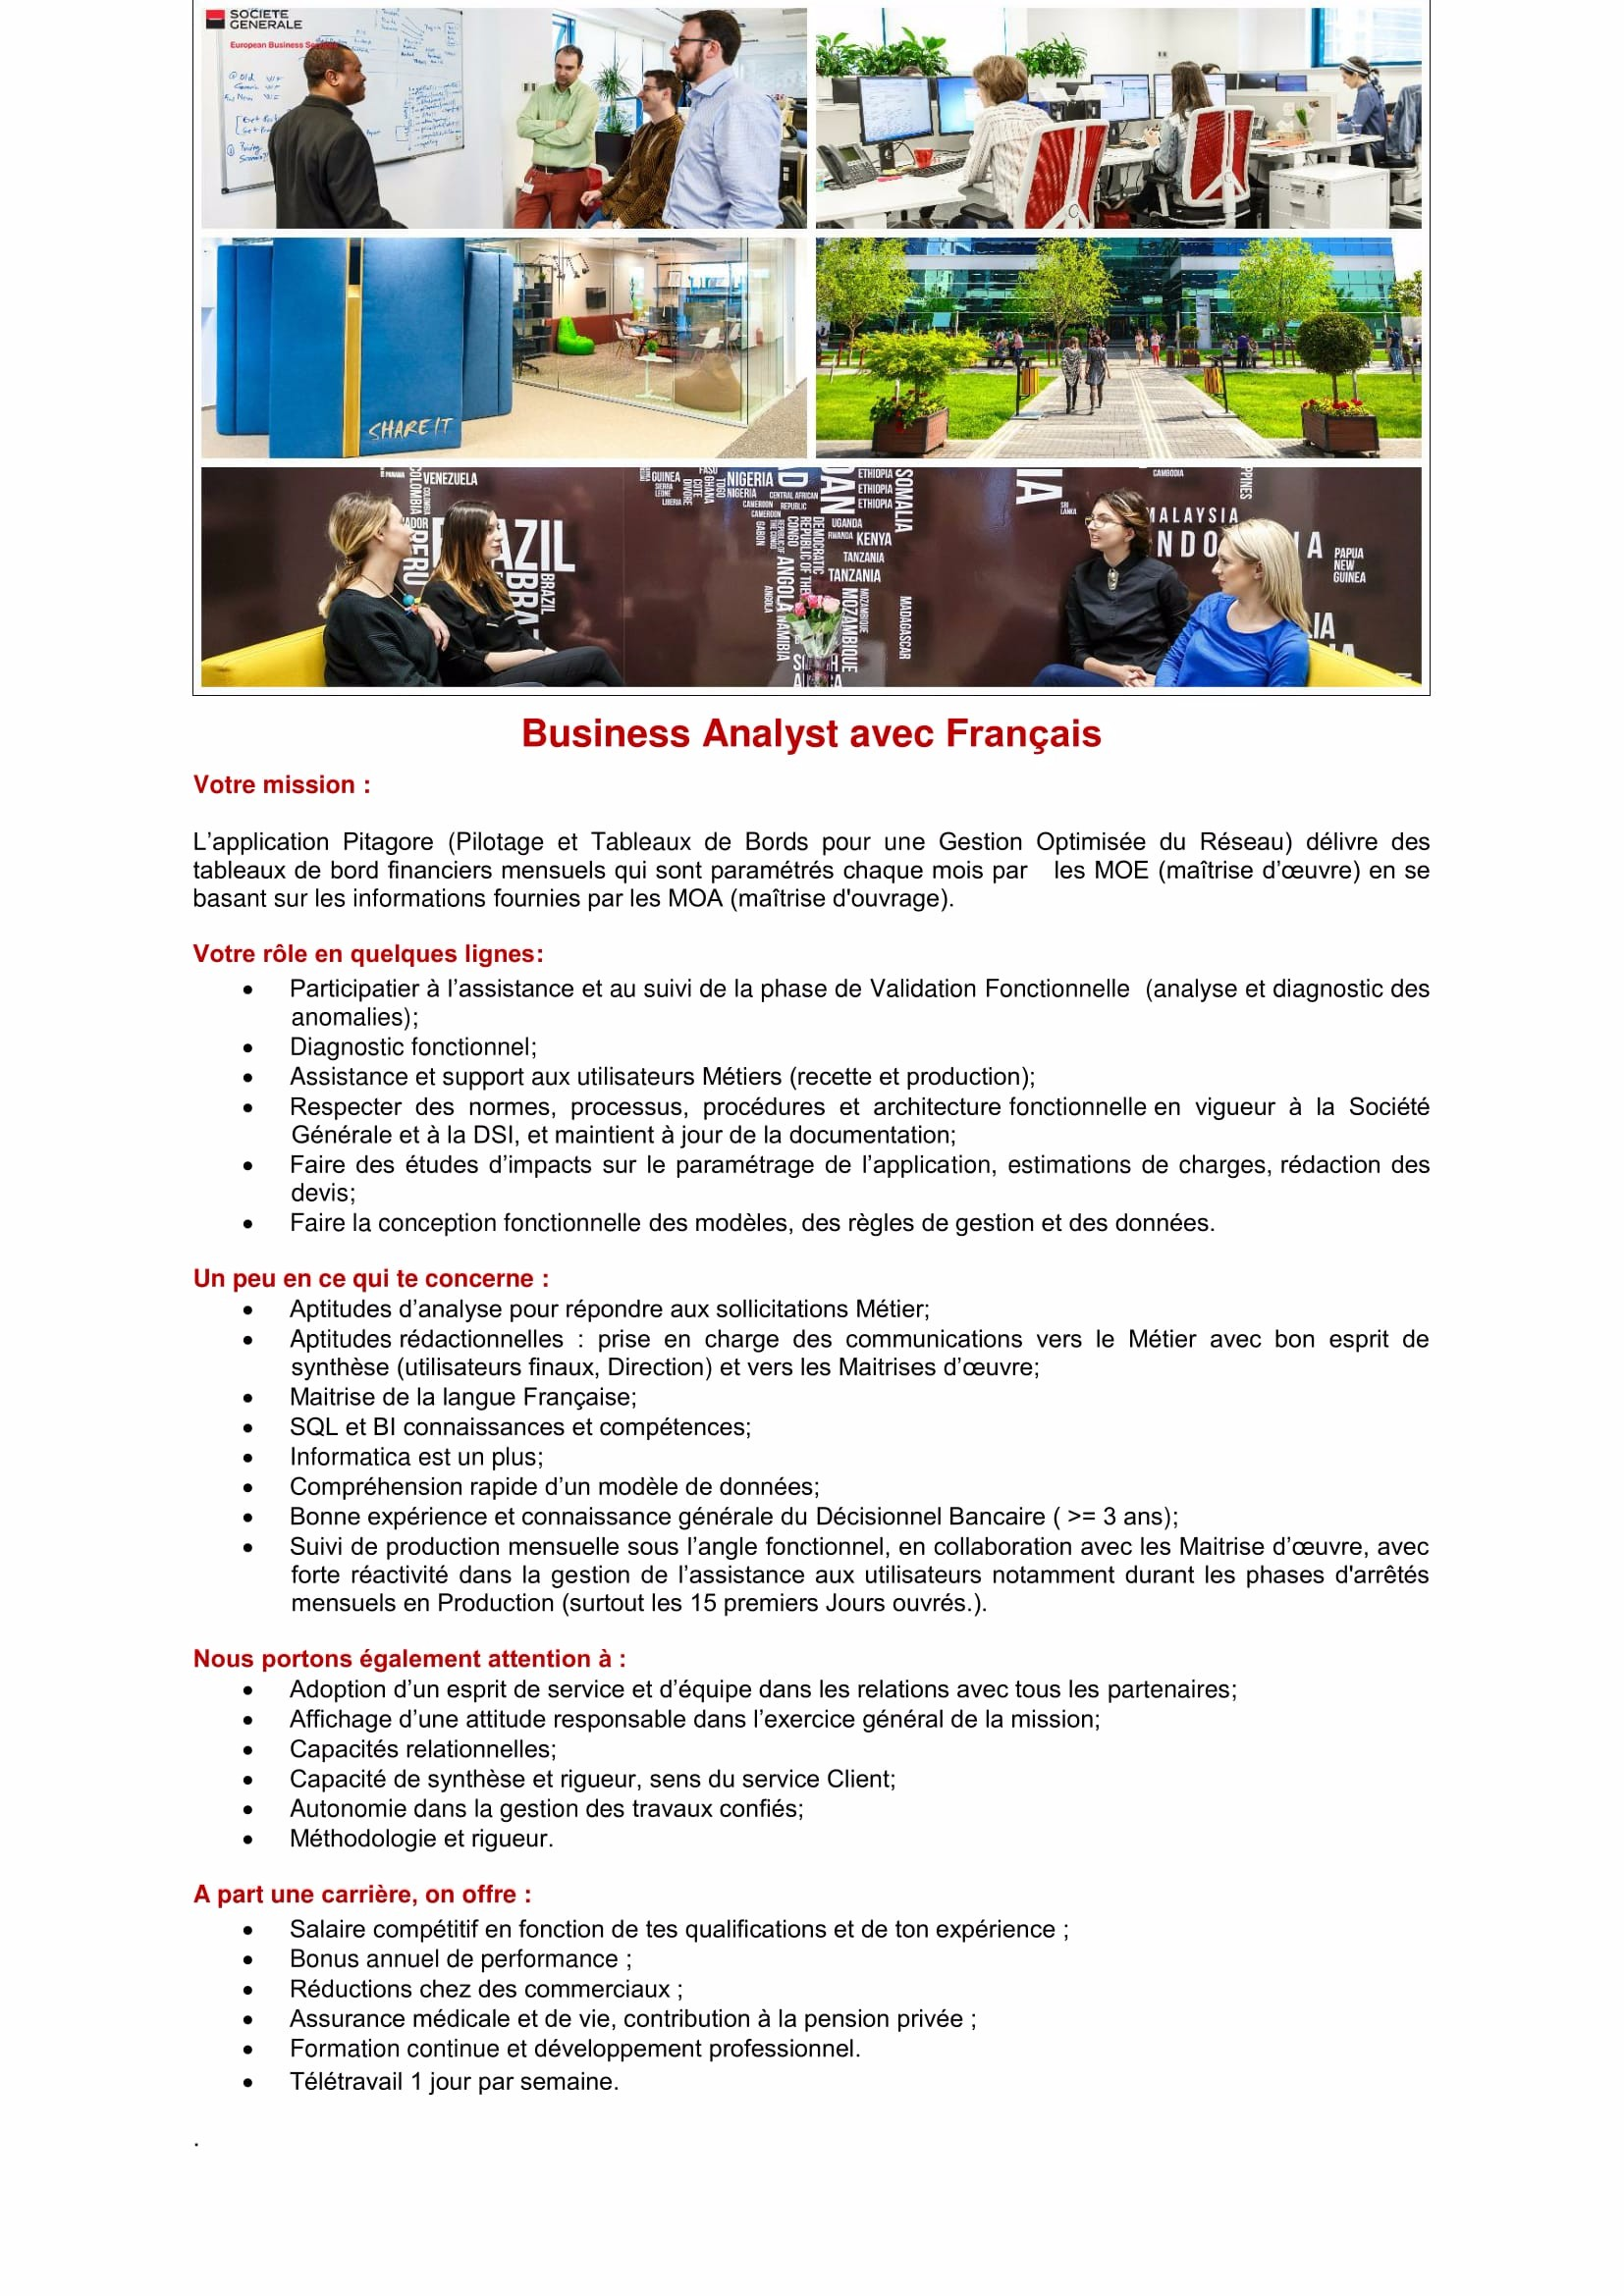 Business Analyst avec Francais-1